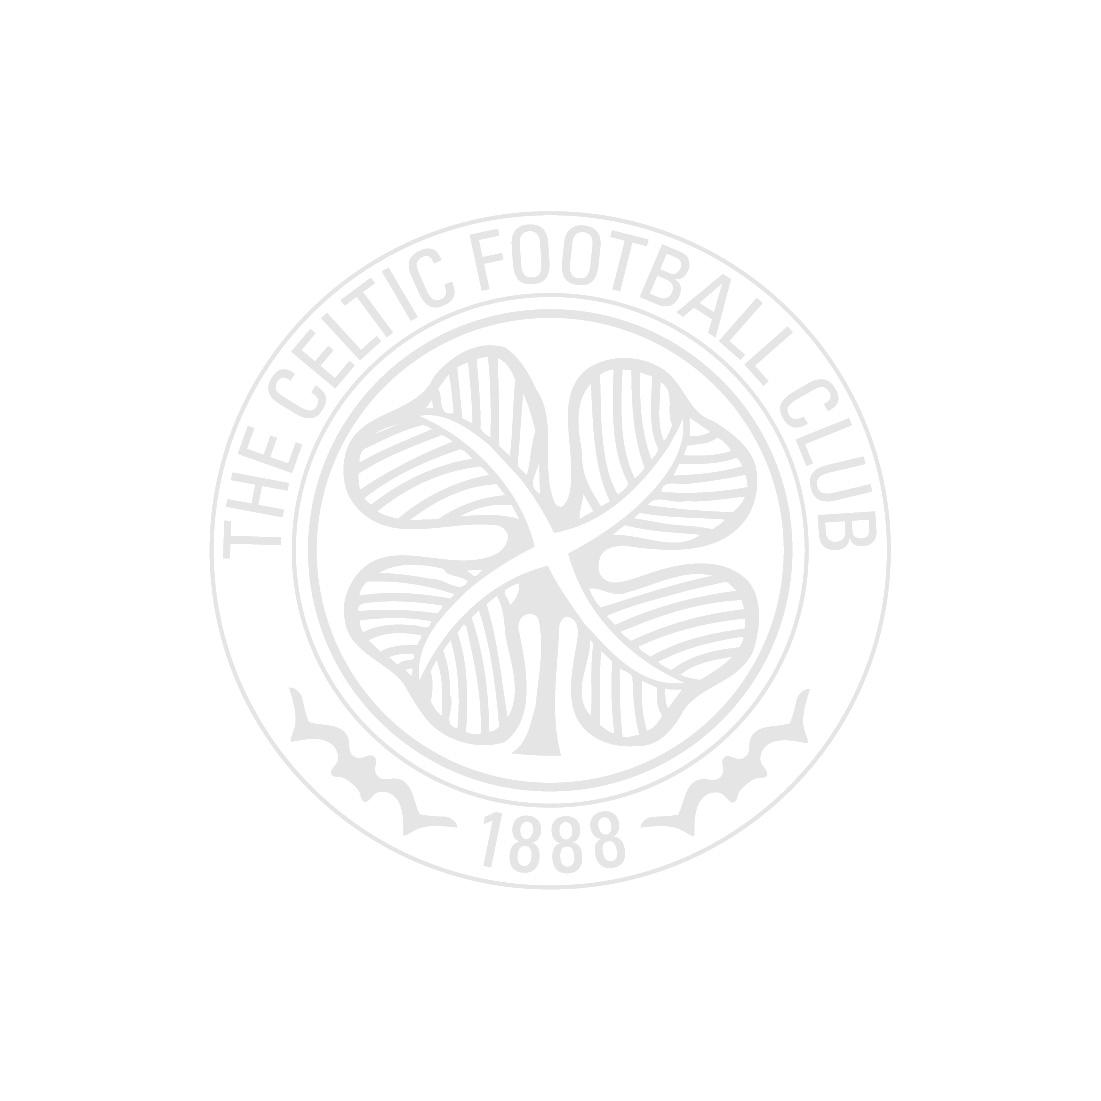 Celtic Bhoys Established 1888 T-shirt